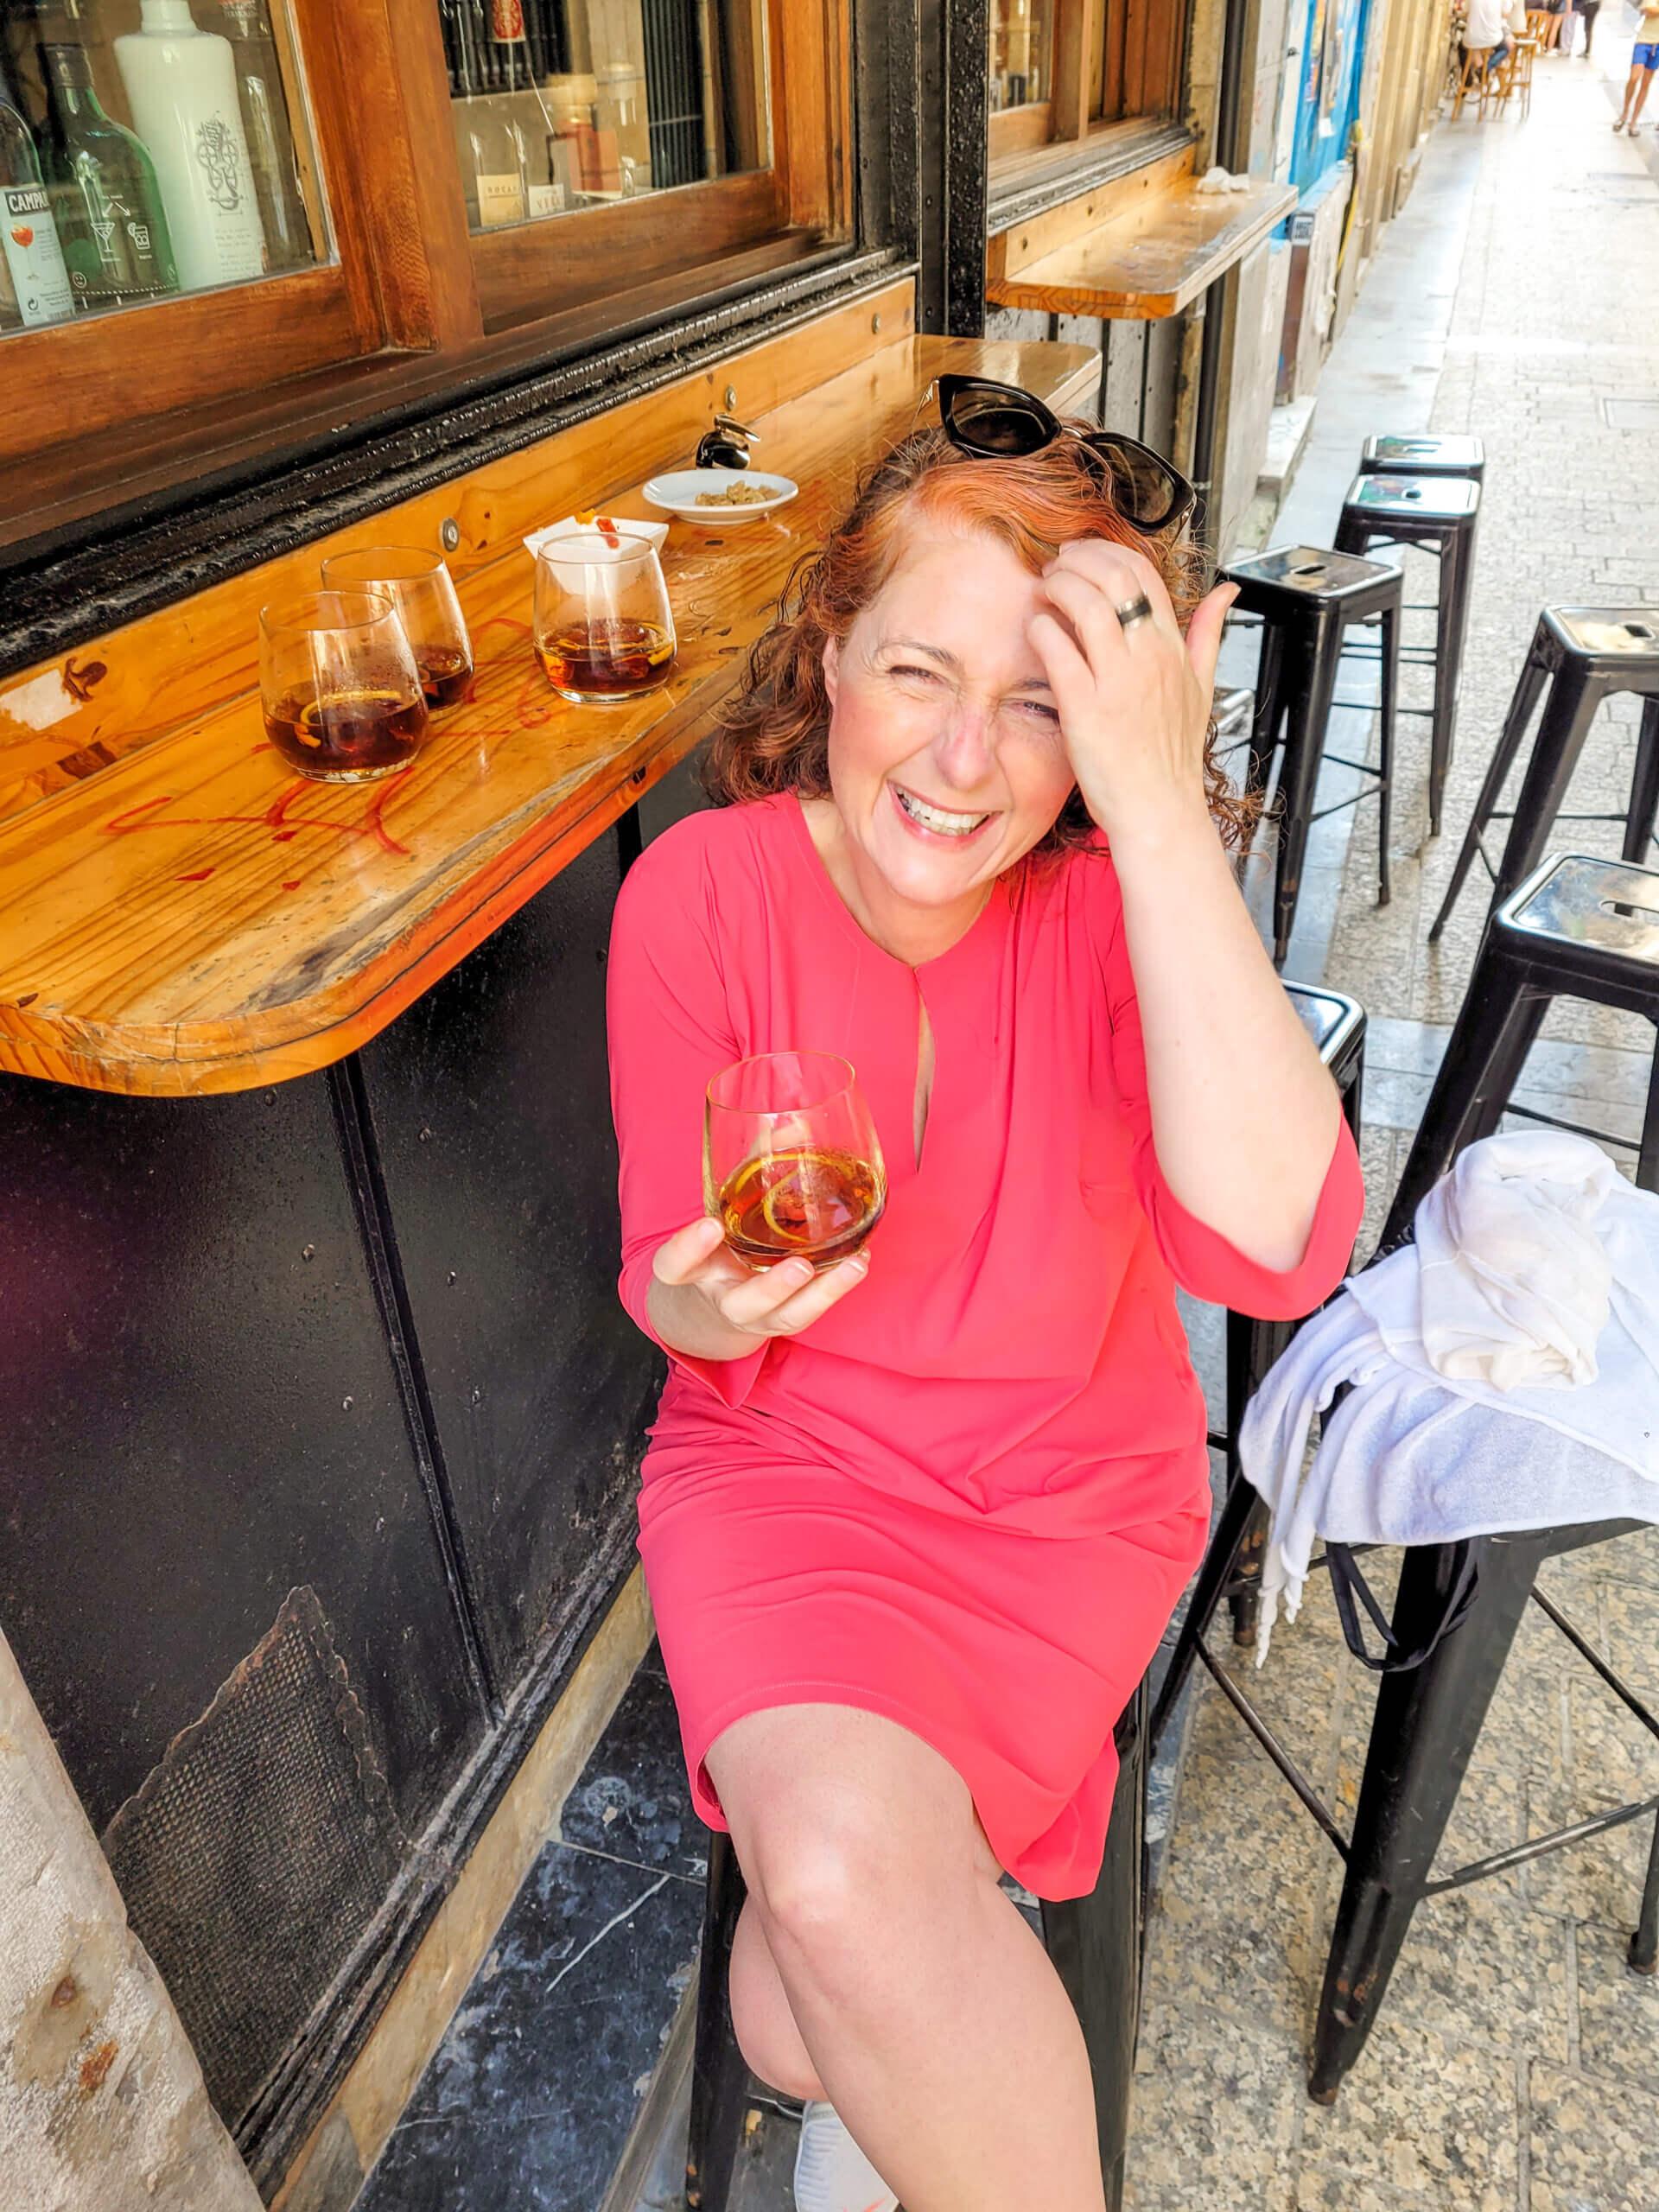 Vermouth in der Bar Minuto y medio in San Sebastián